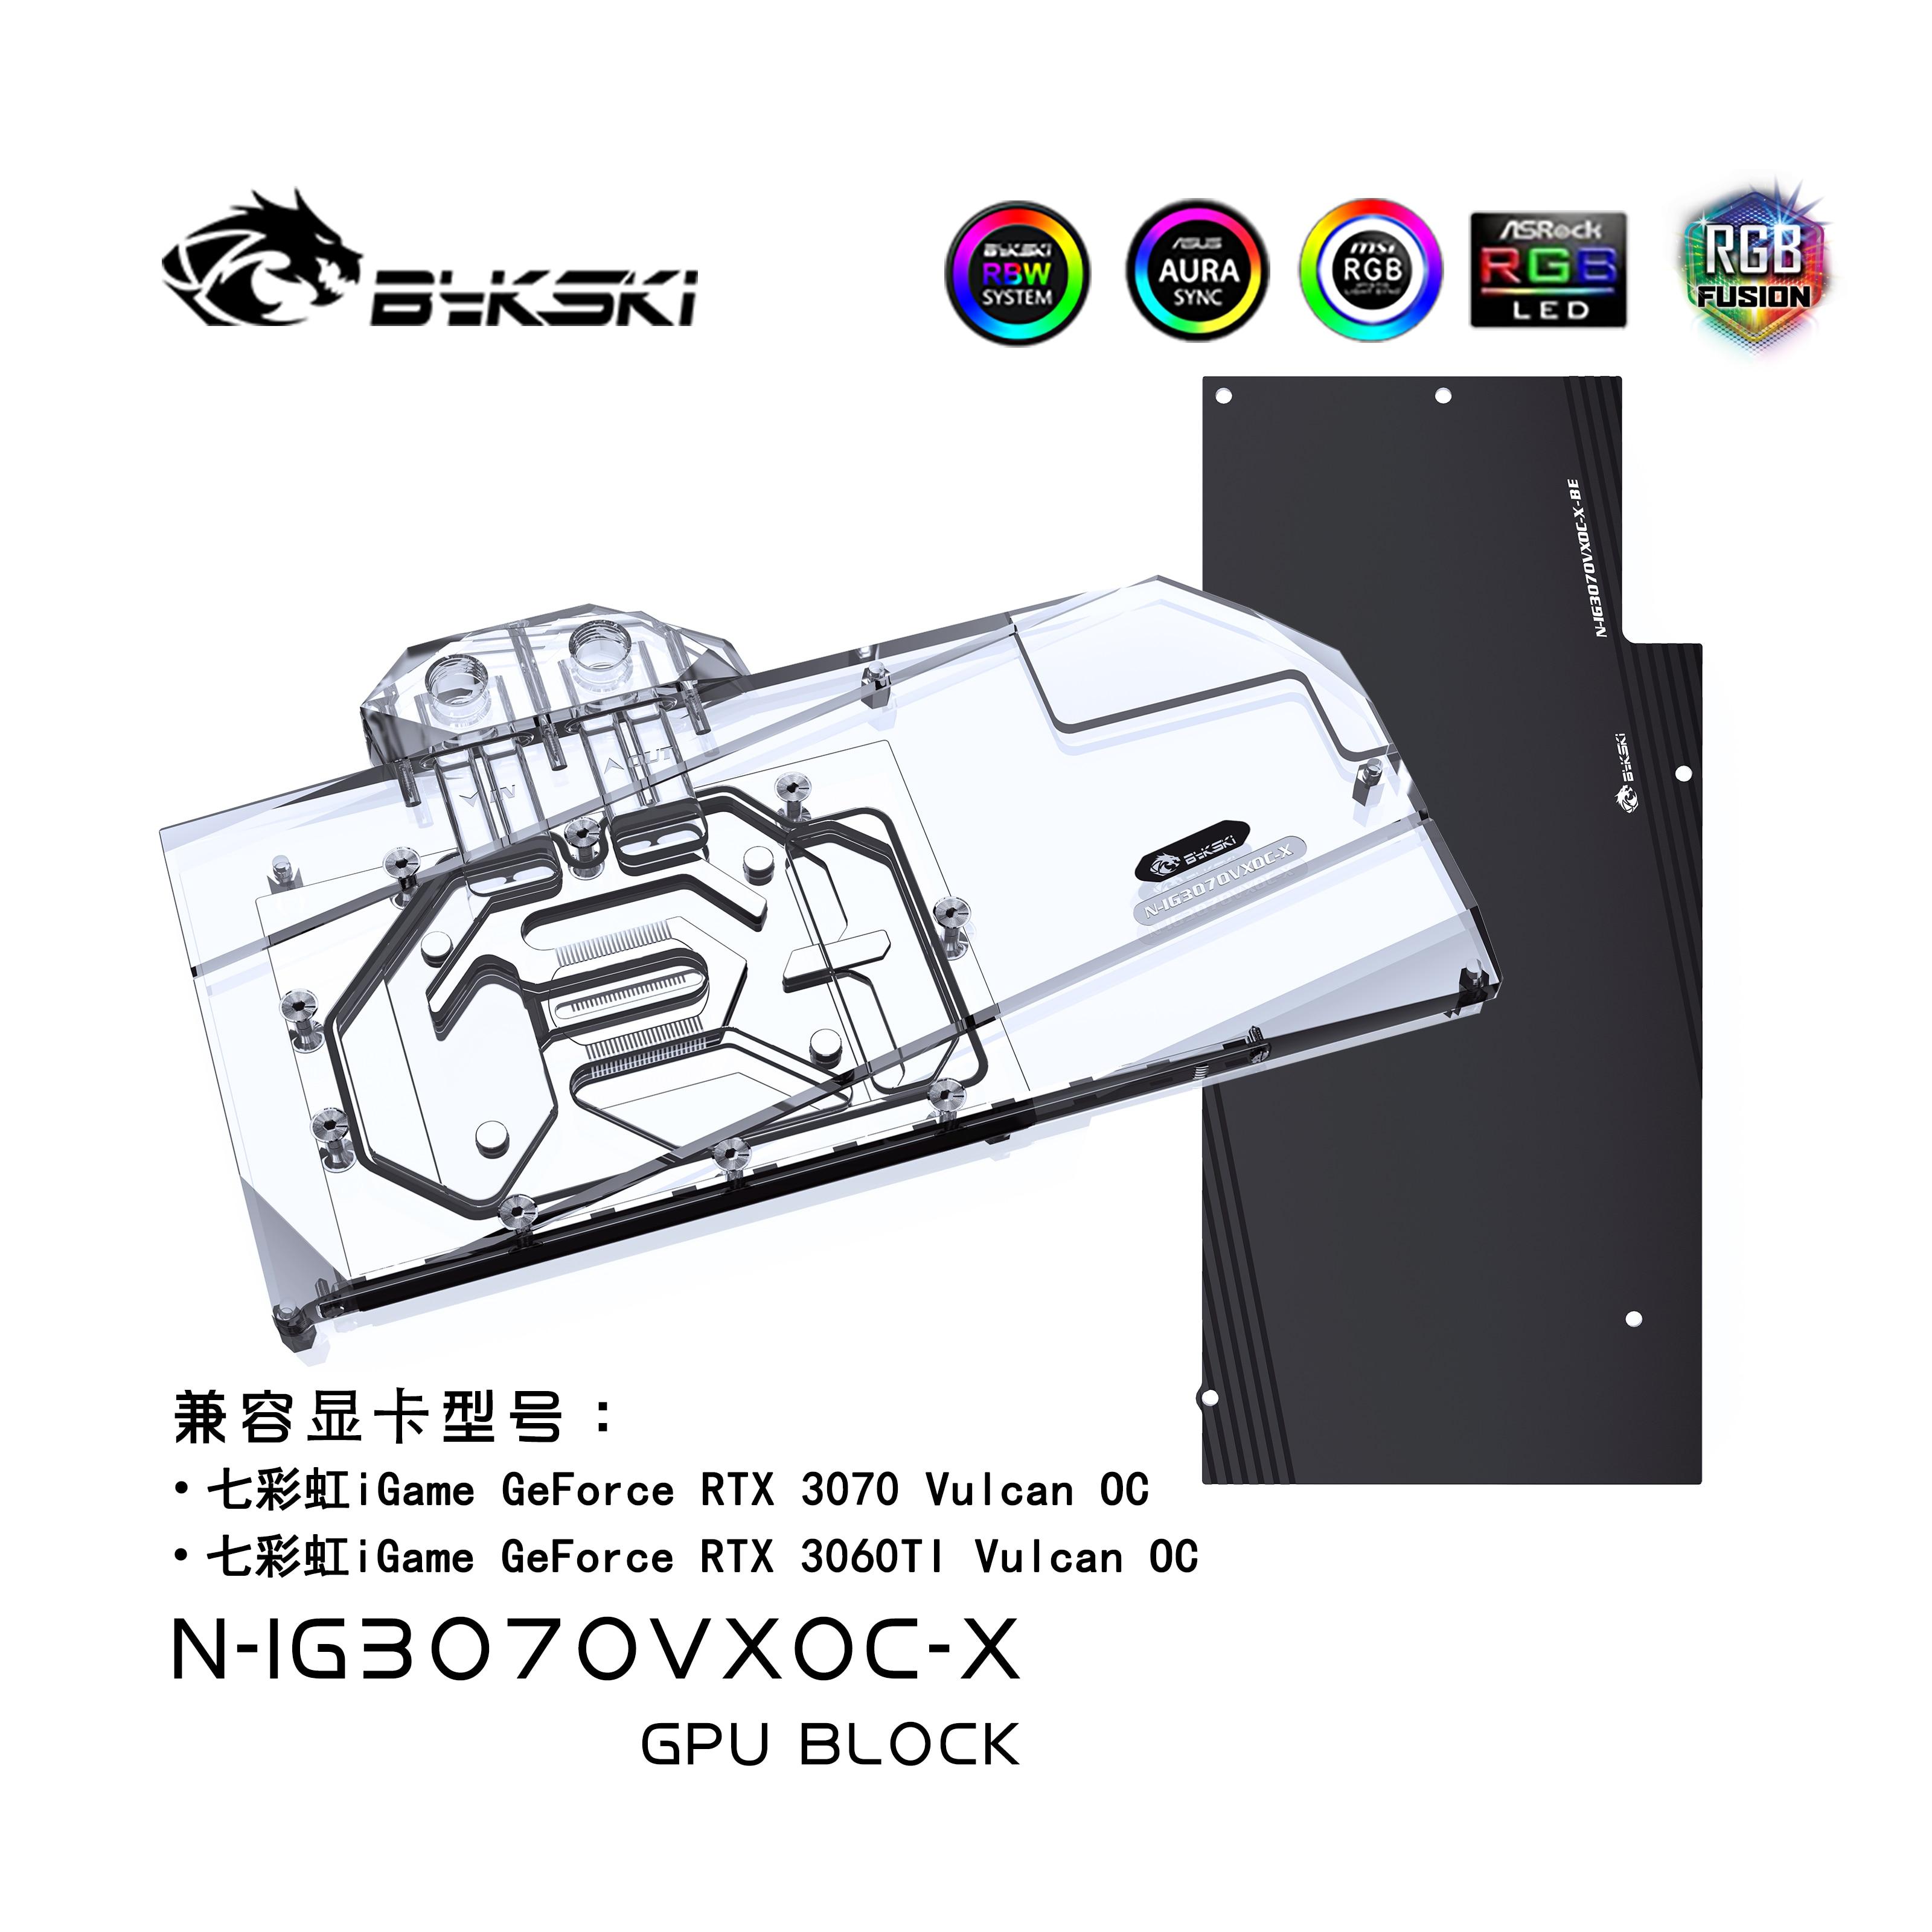 Bykski استخدام كتلة المياه ل RTX 3070 /RTX 3060 TI فولكان OC GPU بطاقة تبريد/النحاس المبرد تبريد N-IG3070VXOC-X